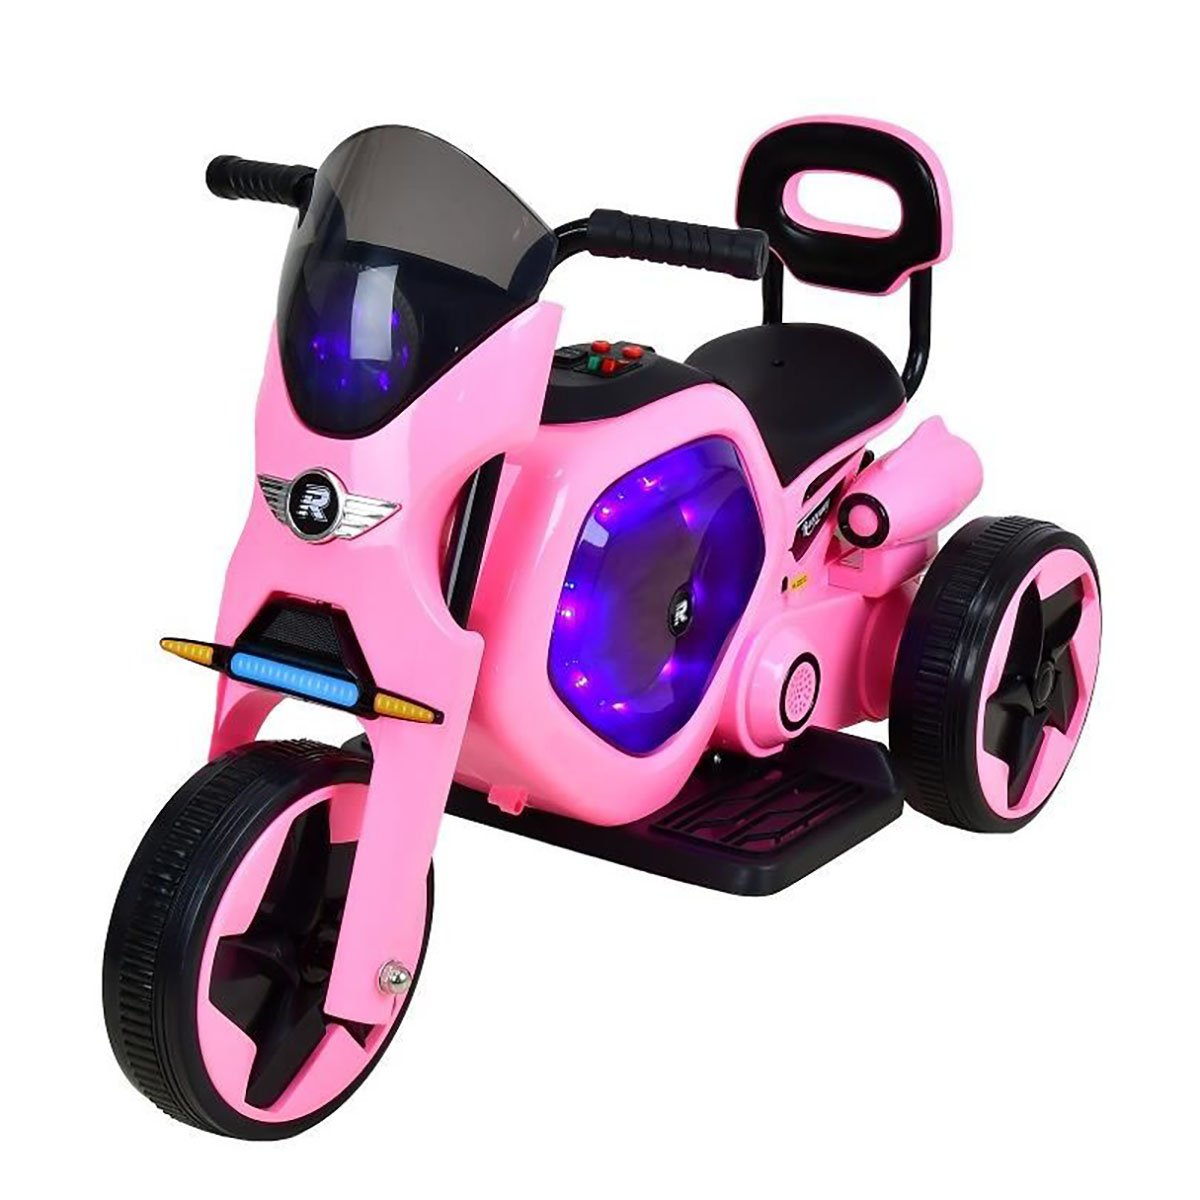 Tricicleta electrica DHS, roz imagine